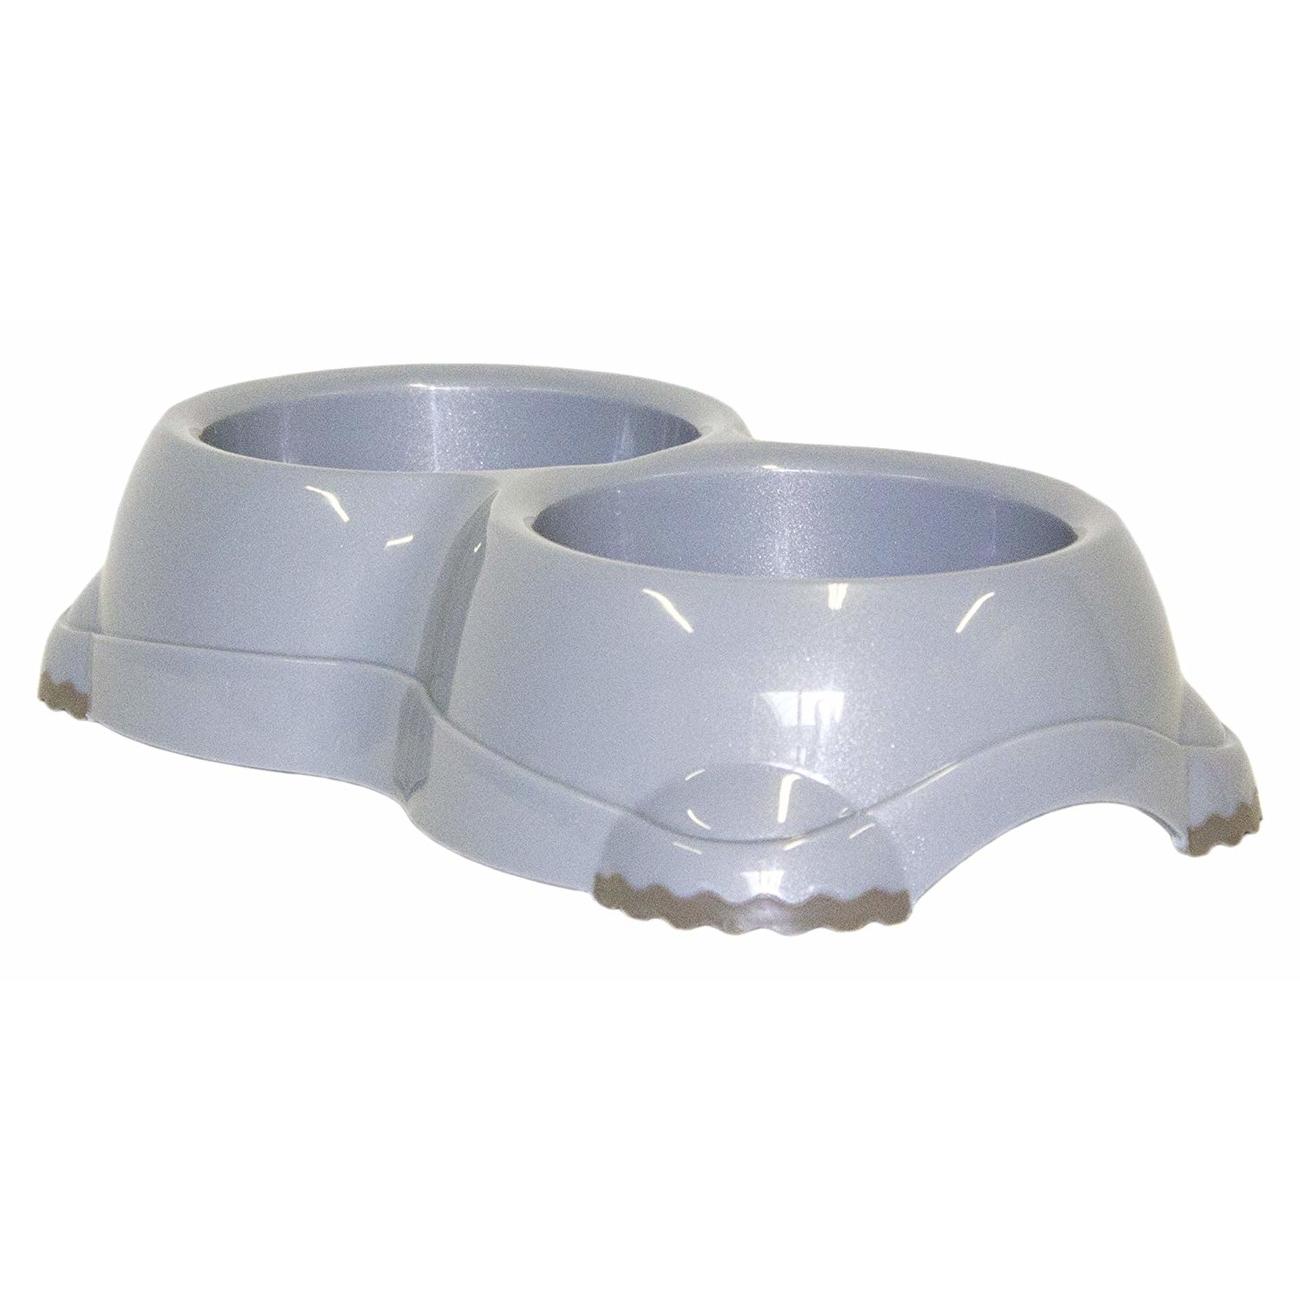 Moderna Doppelnapf Smarty Bowl, Bild 4